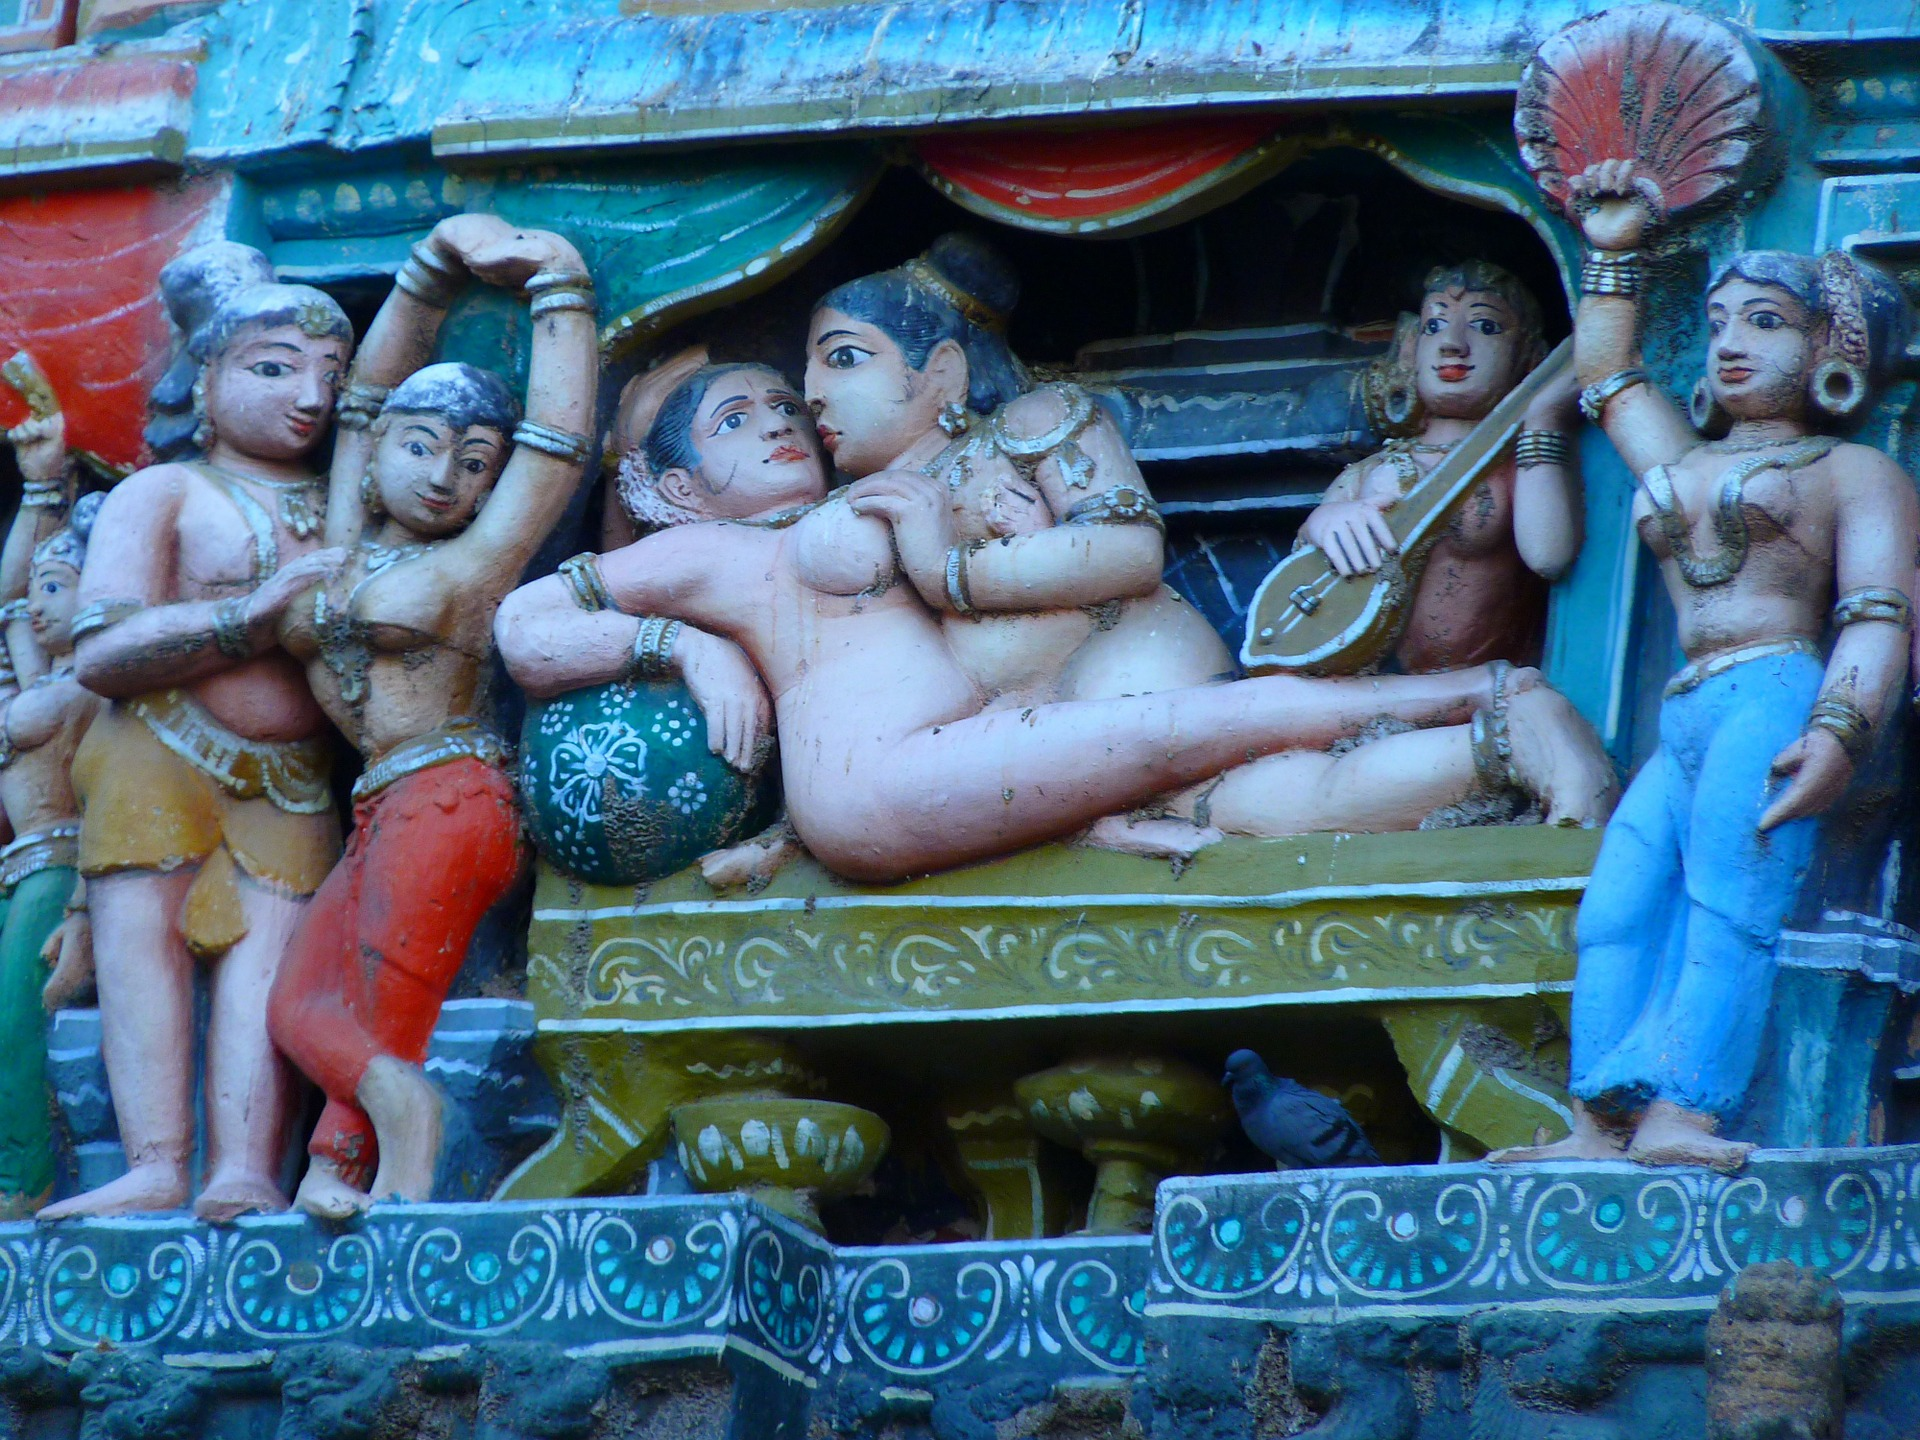 temple-figures-52012_1920.jpg